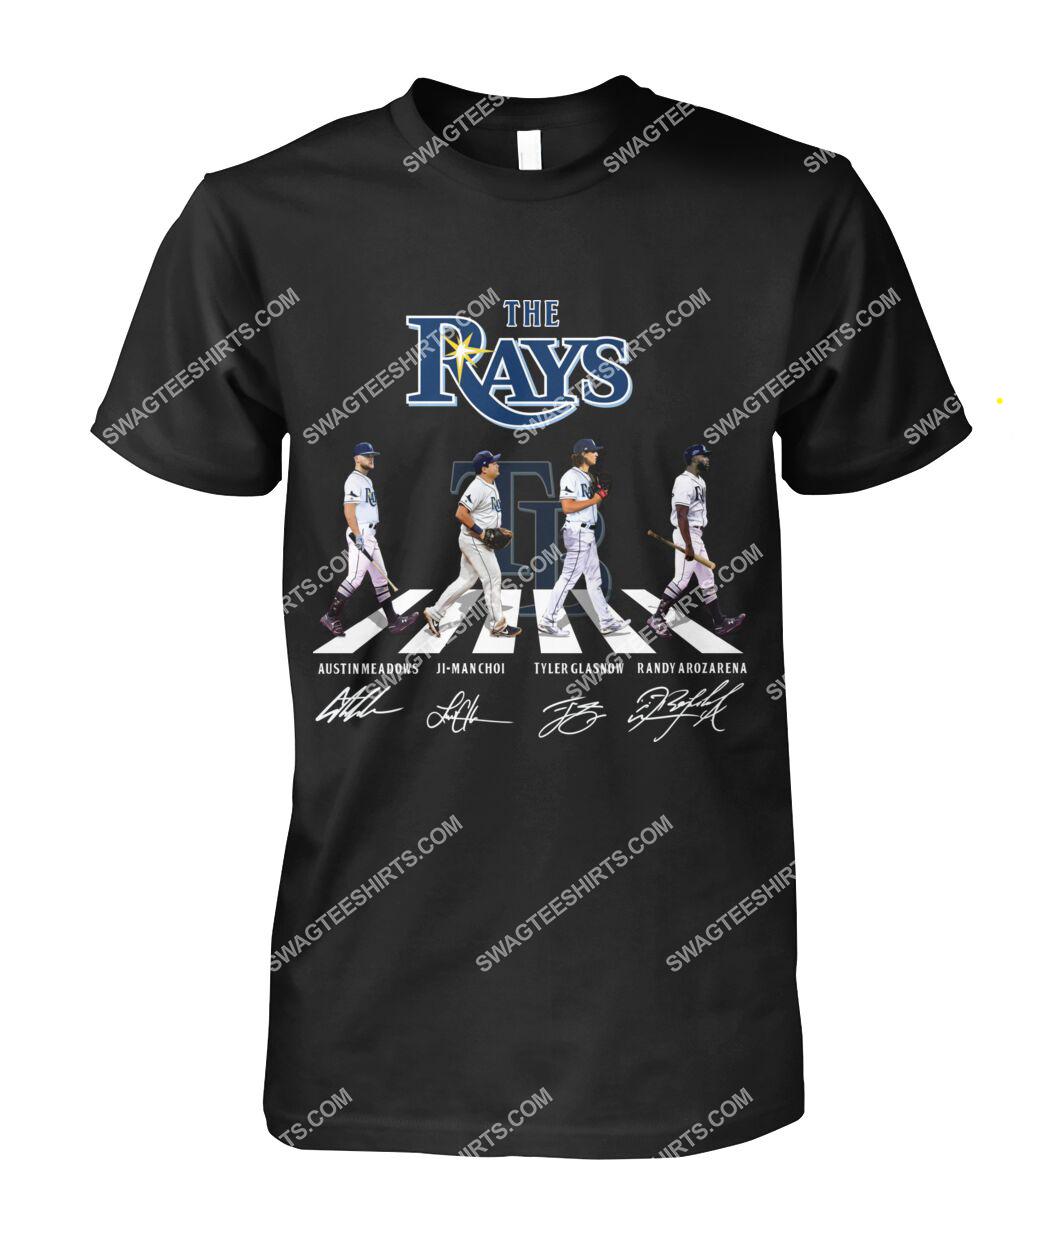 the tampa bay rays walking abbey road tshirt 1